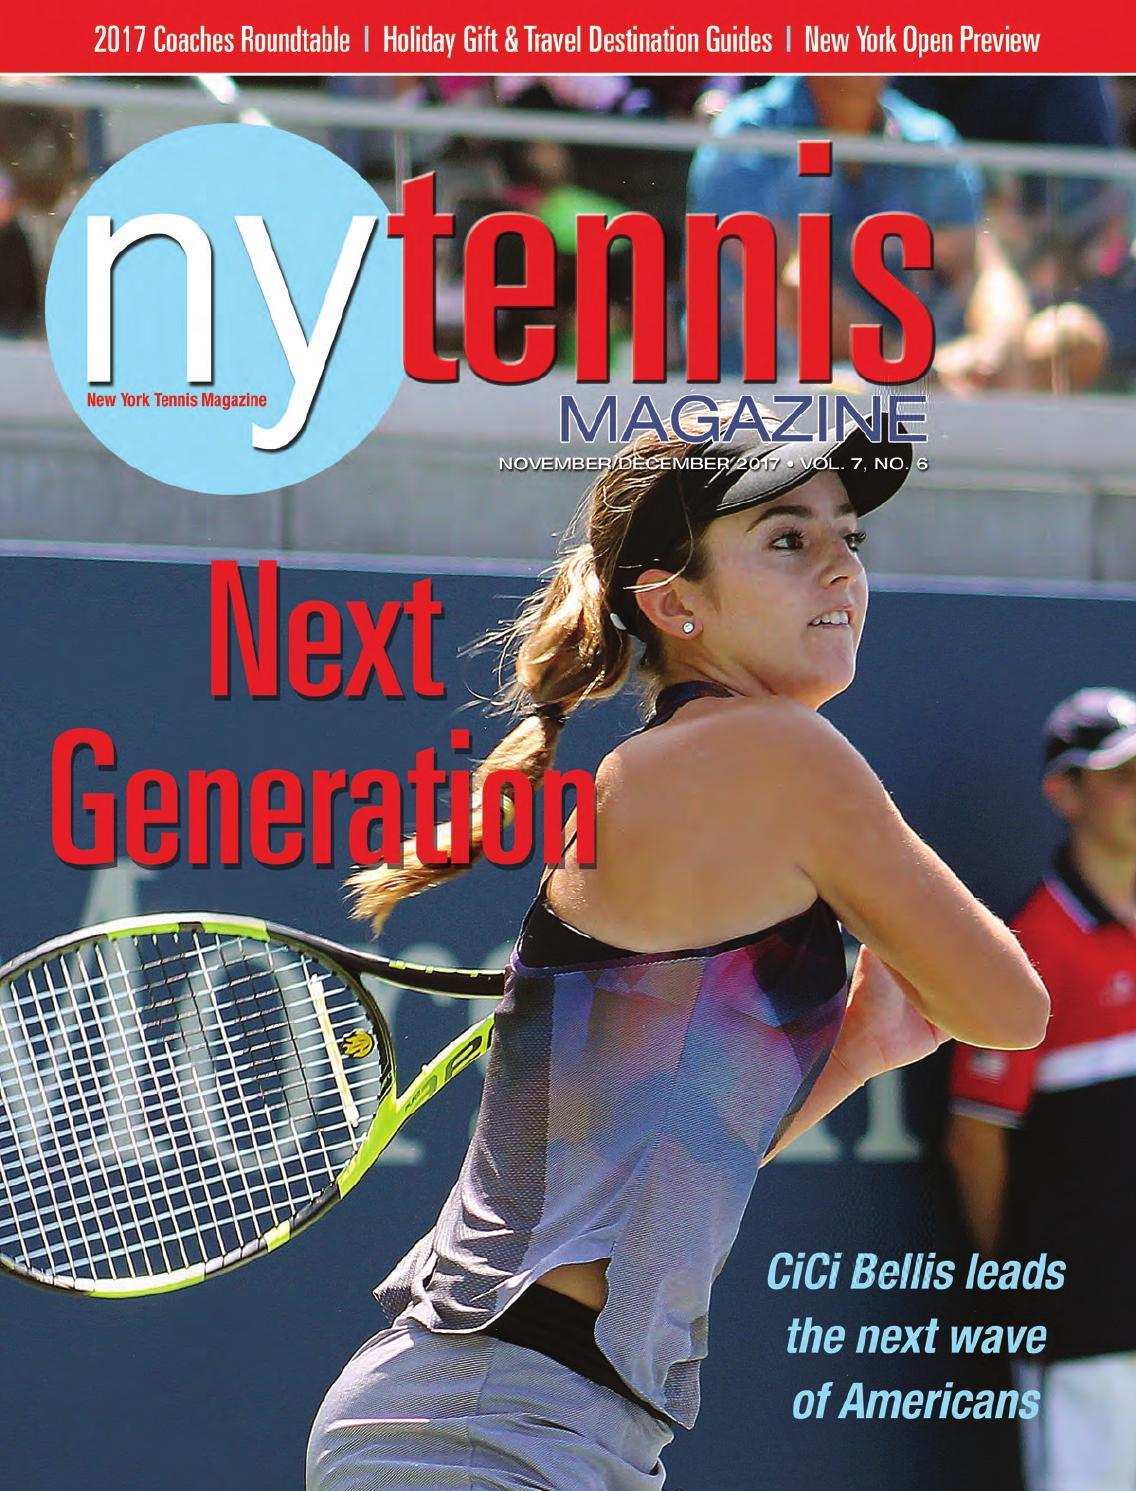 New york tennis magazine november december 2017 by nmp media new york tennis magazine november december 2017 by nmp media corp issuu buycottarizona